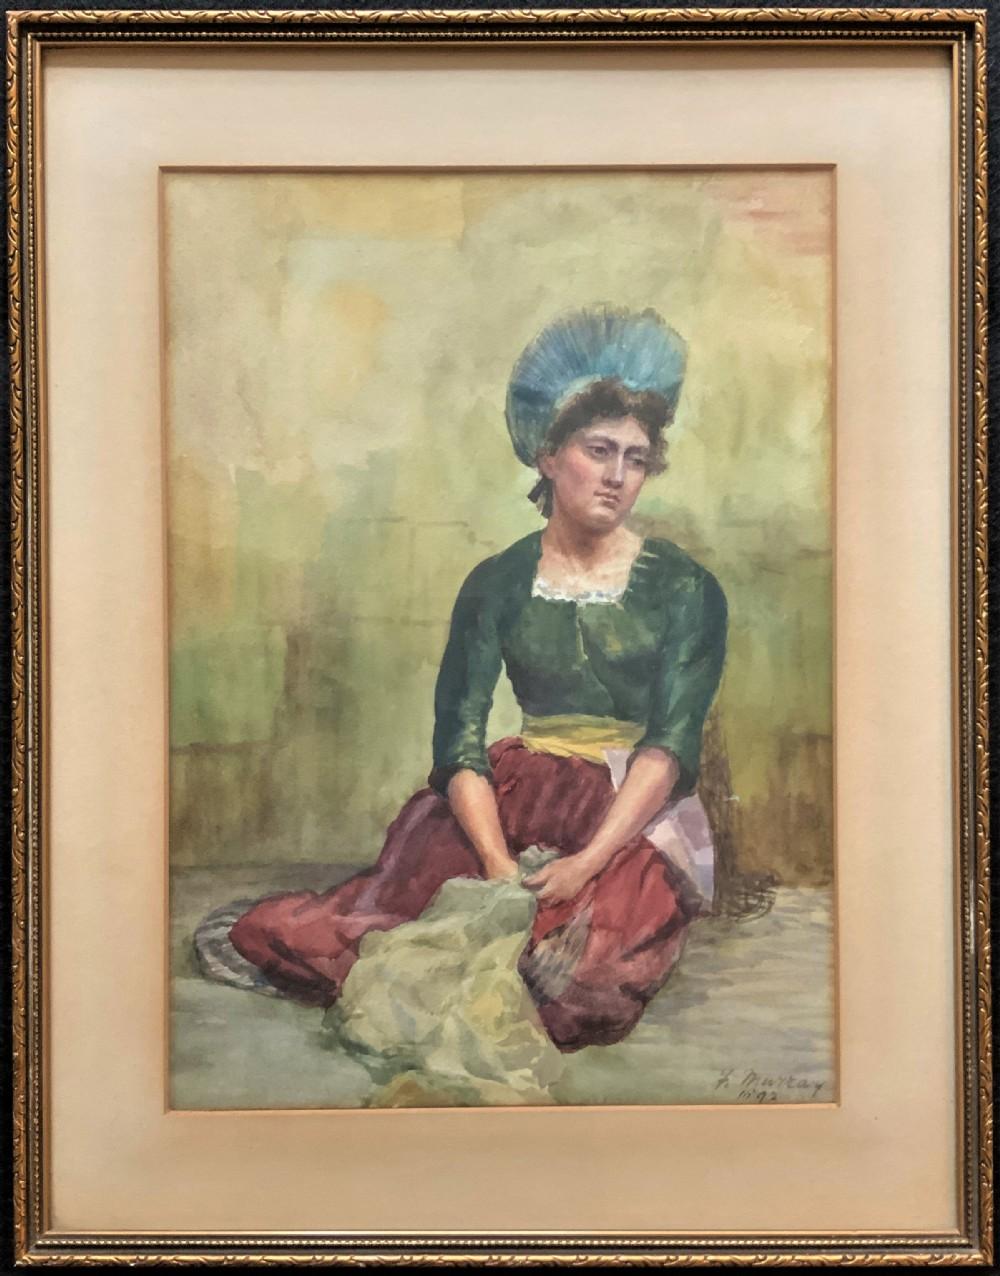 'f murray' scottish stunning quality late 19thc portrait watercolour painting